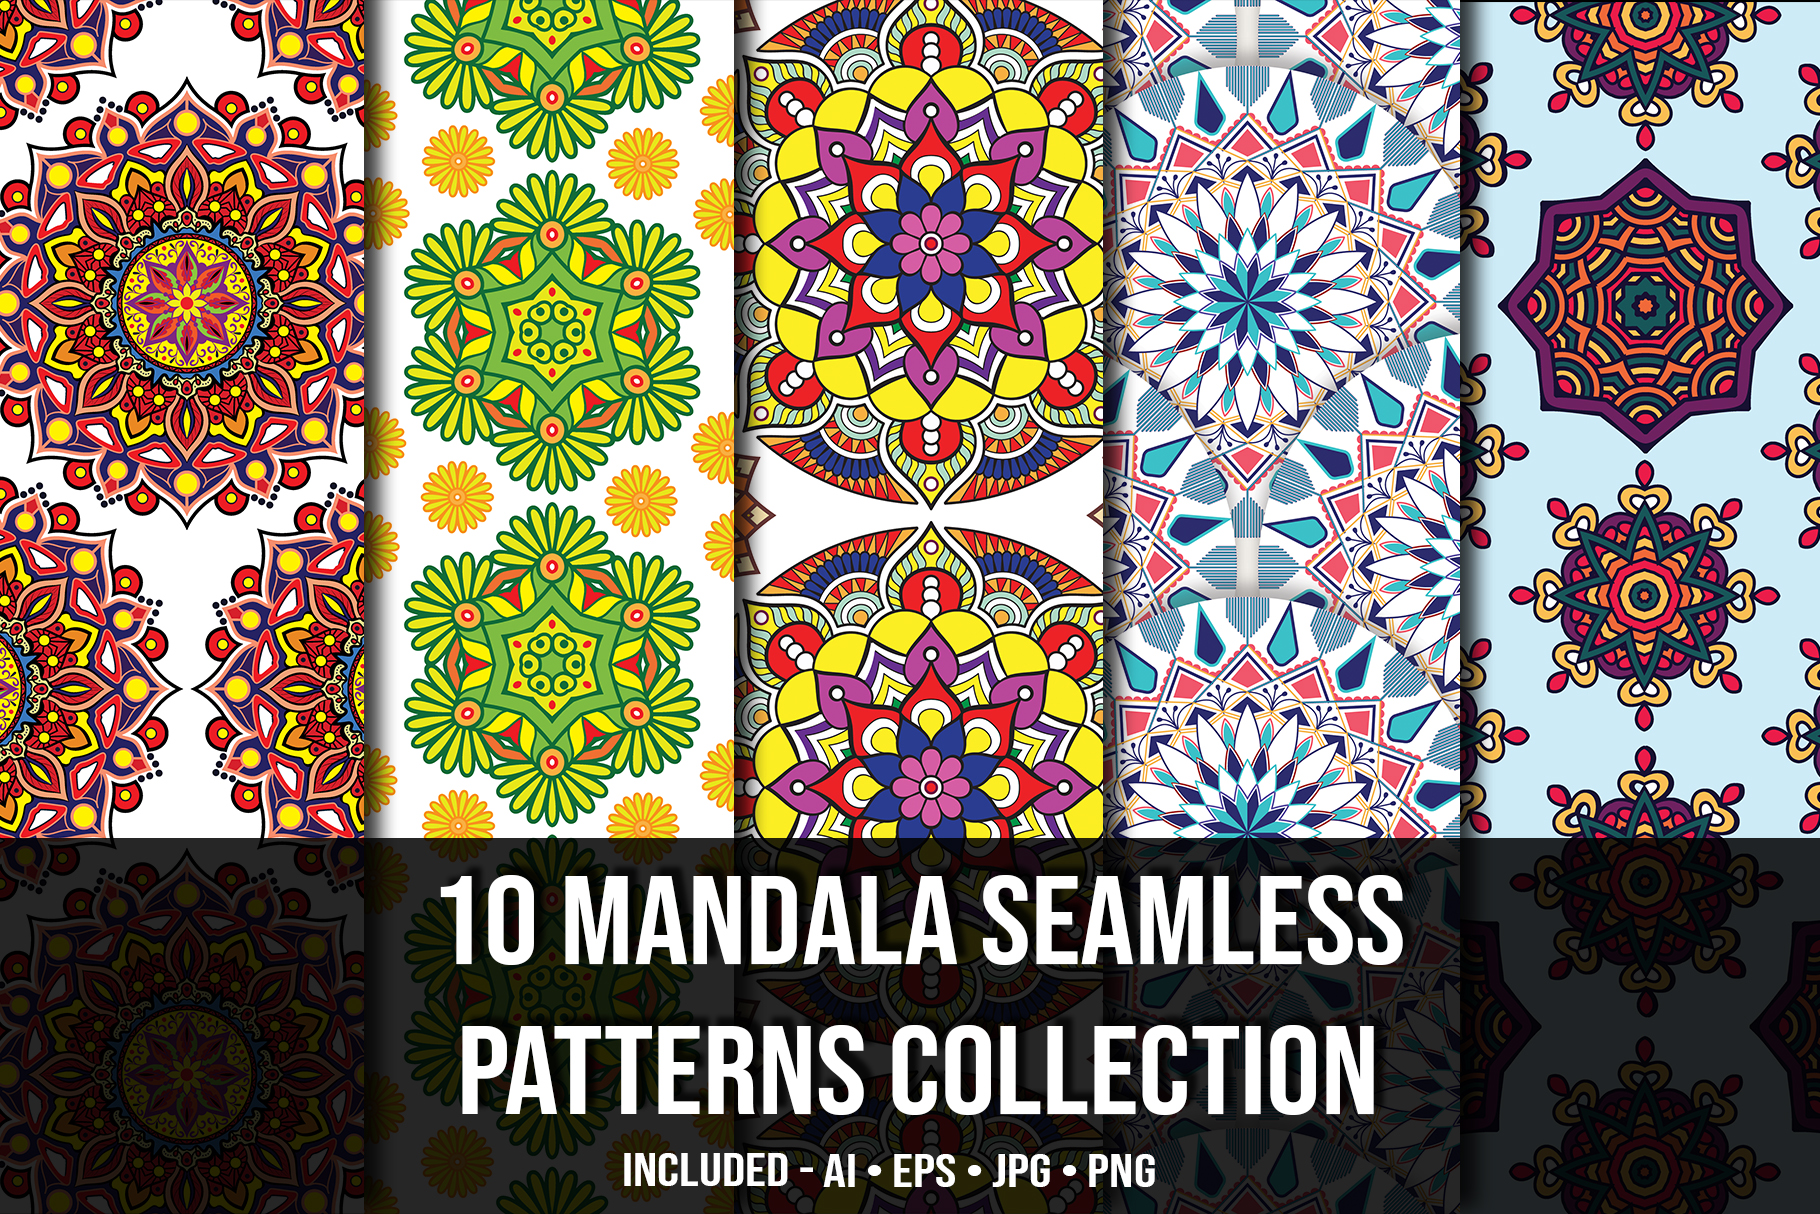 Mandala seamless collection.